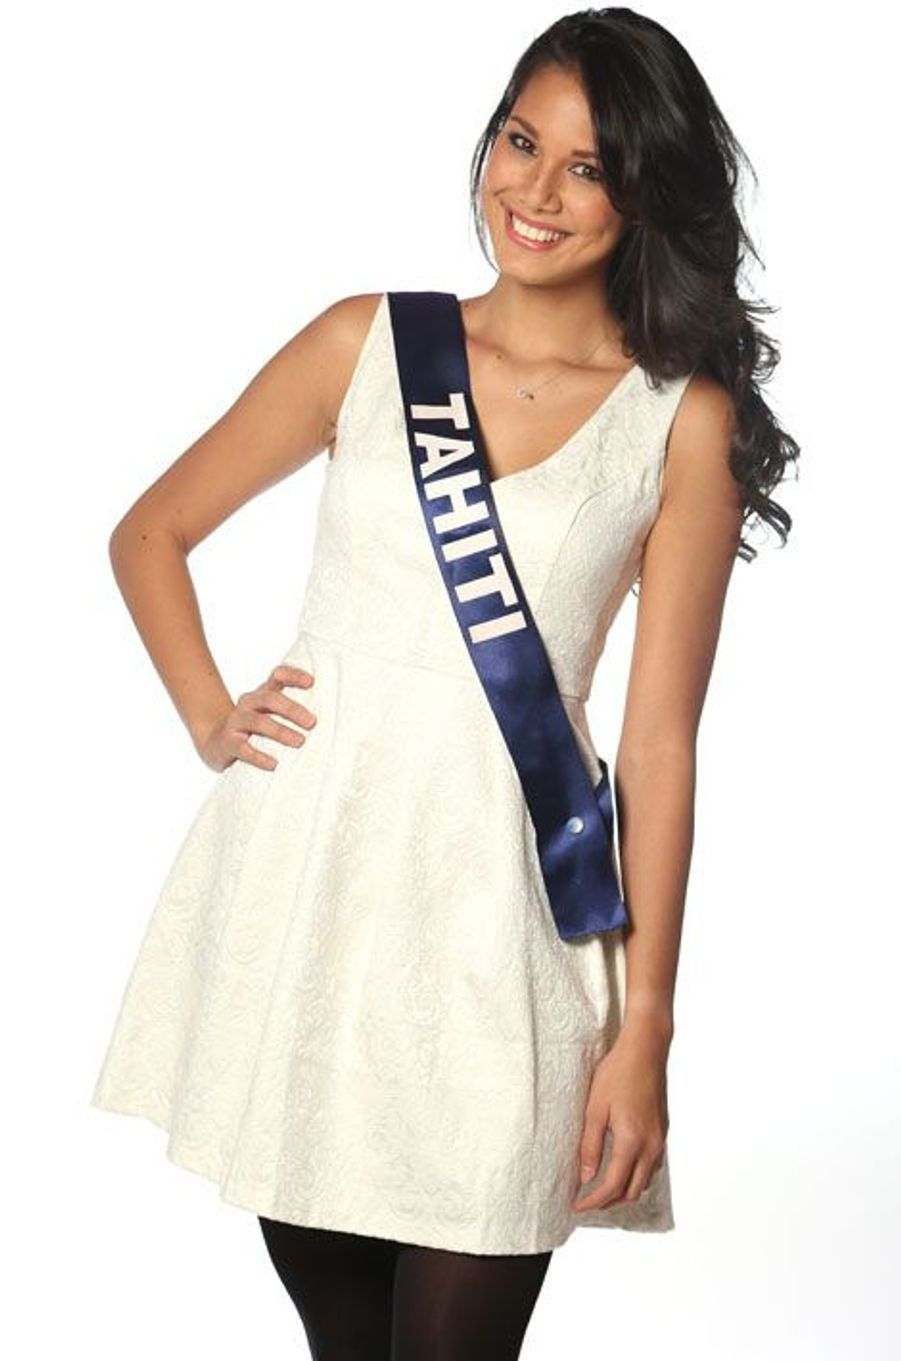 Mehiata Riaria, 22 ans, Miss Tahiti